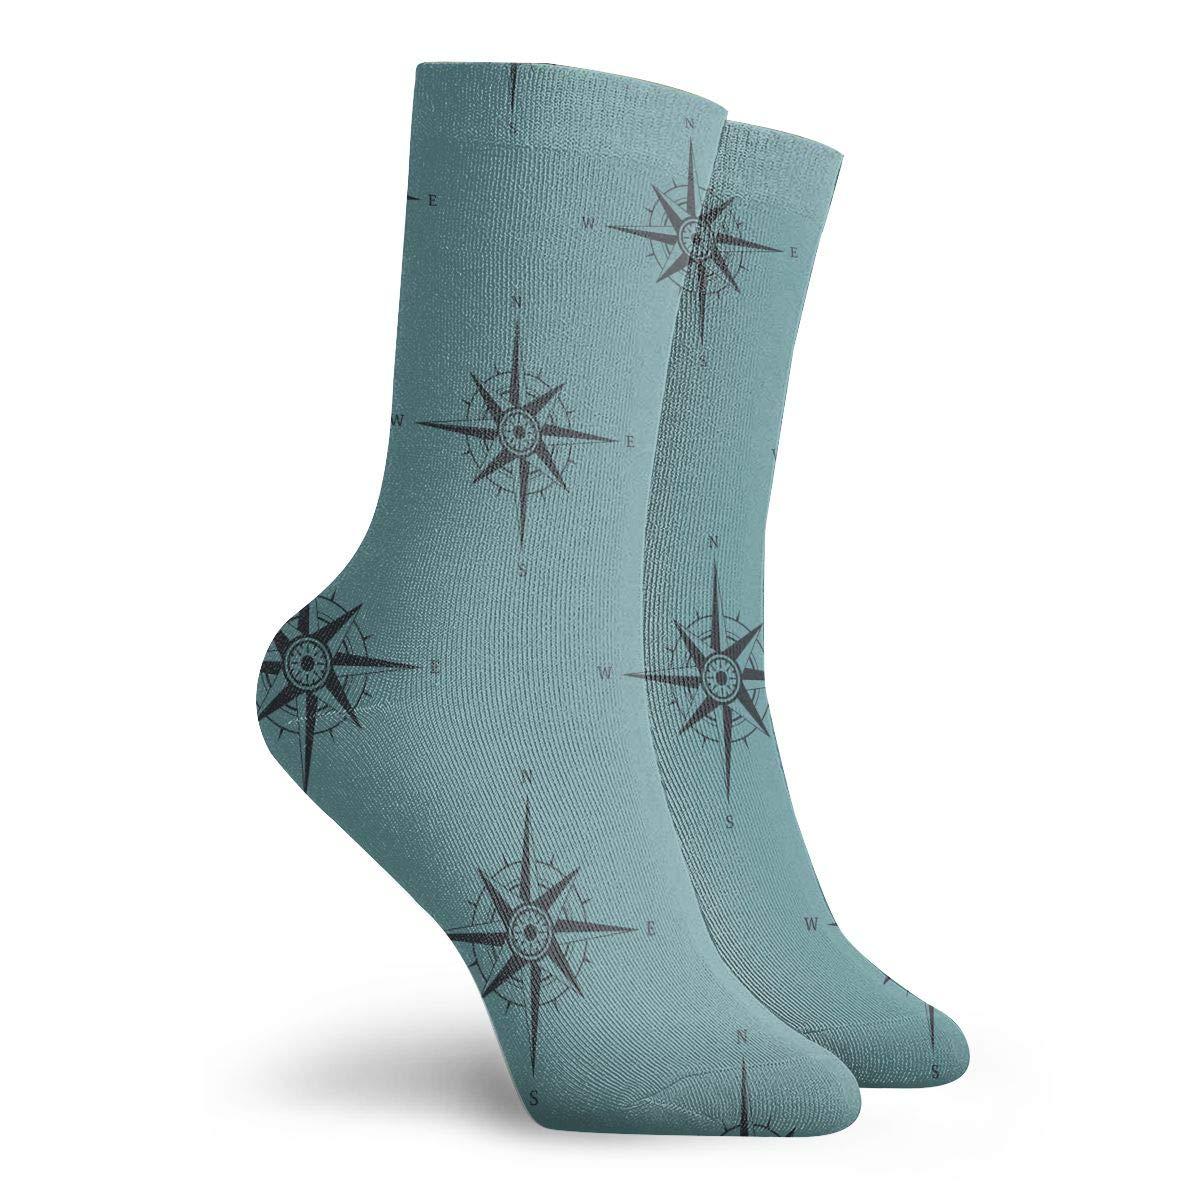 Navigation Compass Unisex Funny Casual Crew Socks Athletic Socks For Boys Girls Kids Teenagers